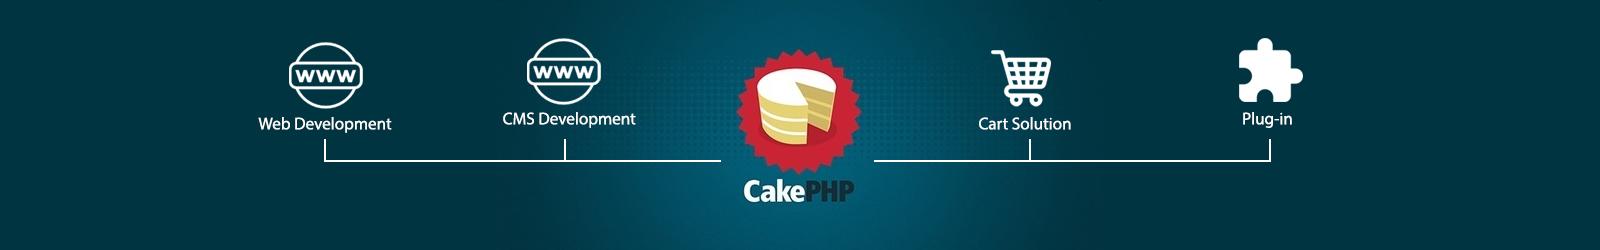 Cakephp web development company